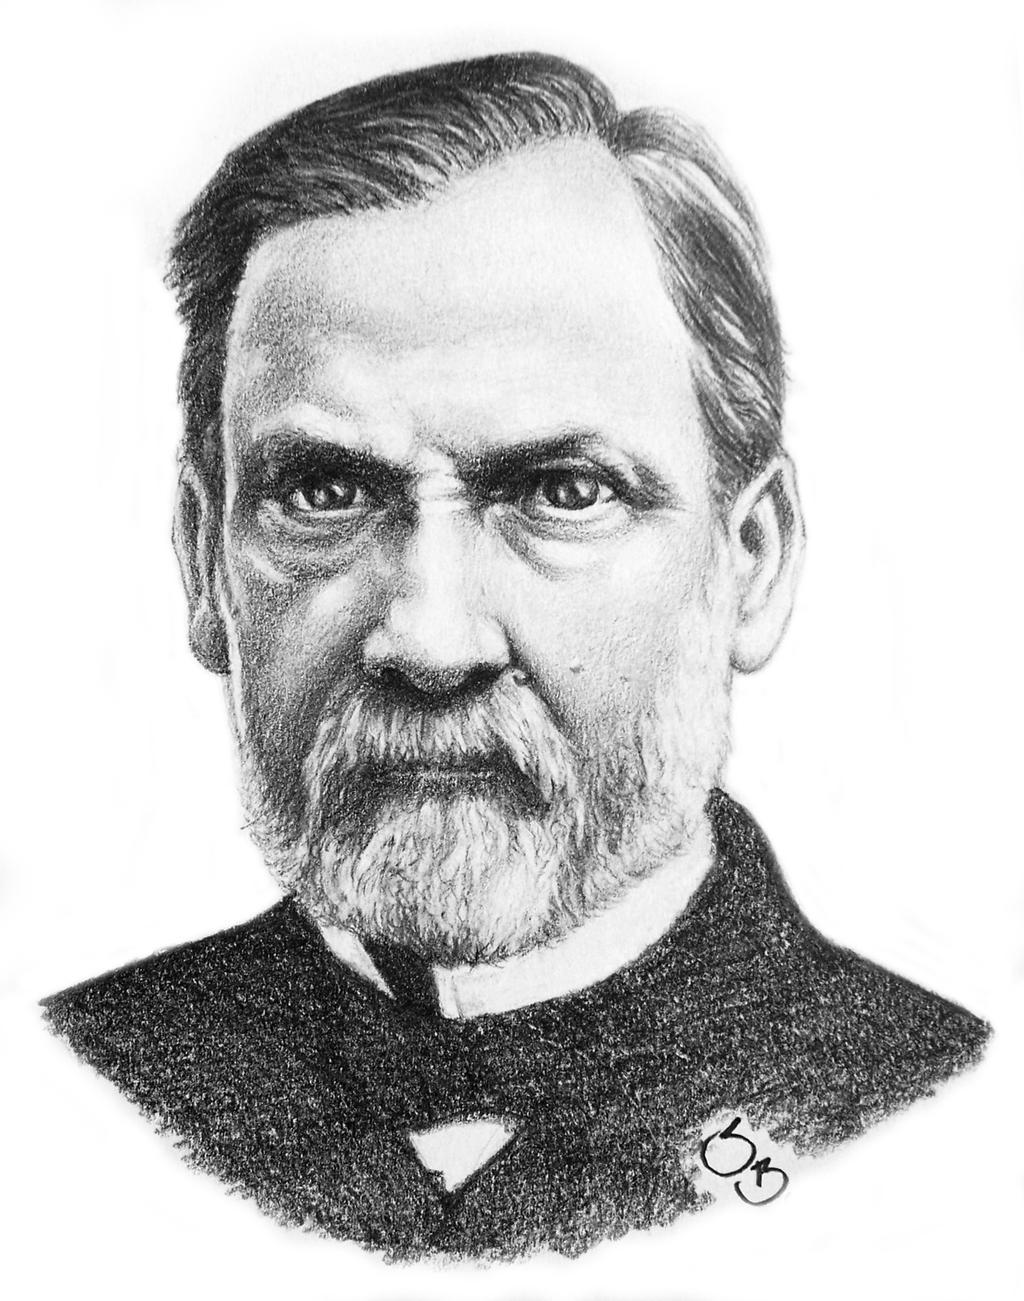 Louis Pasteur by subhankar-biswas Louis Pasteur by subhankar-biswas - louis_pasteur_by_subhankar_biswas-d78k8sv